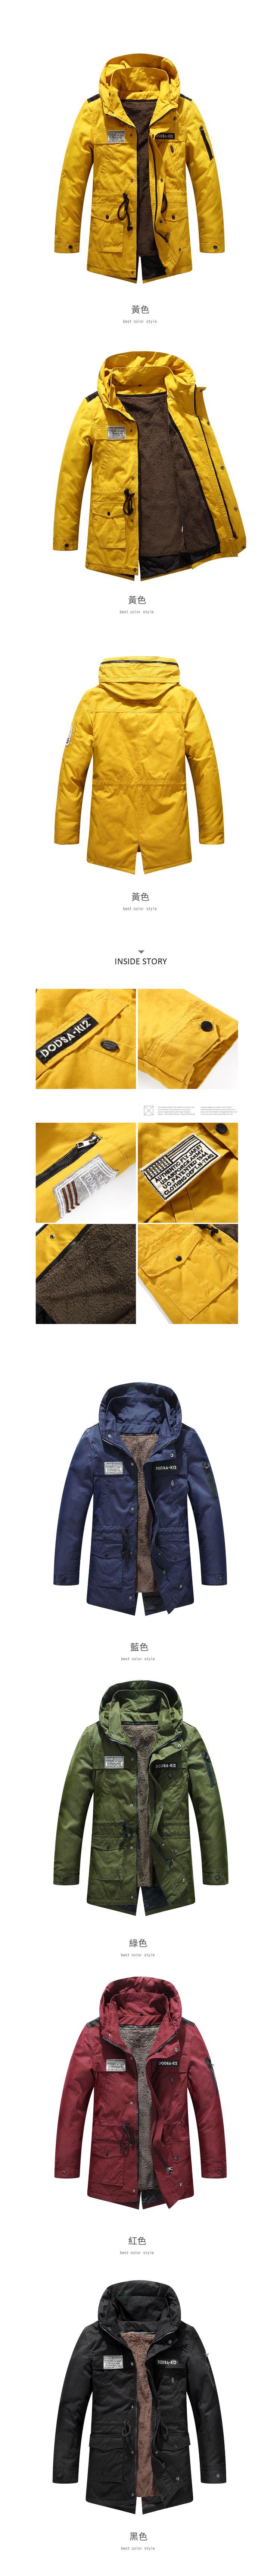 MA-1電繡設計.內毛裡可拆.軍裝大衣